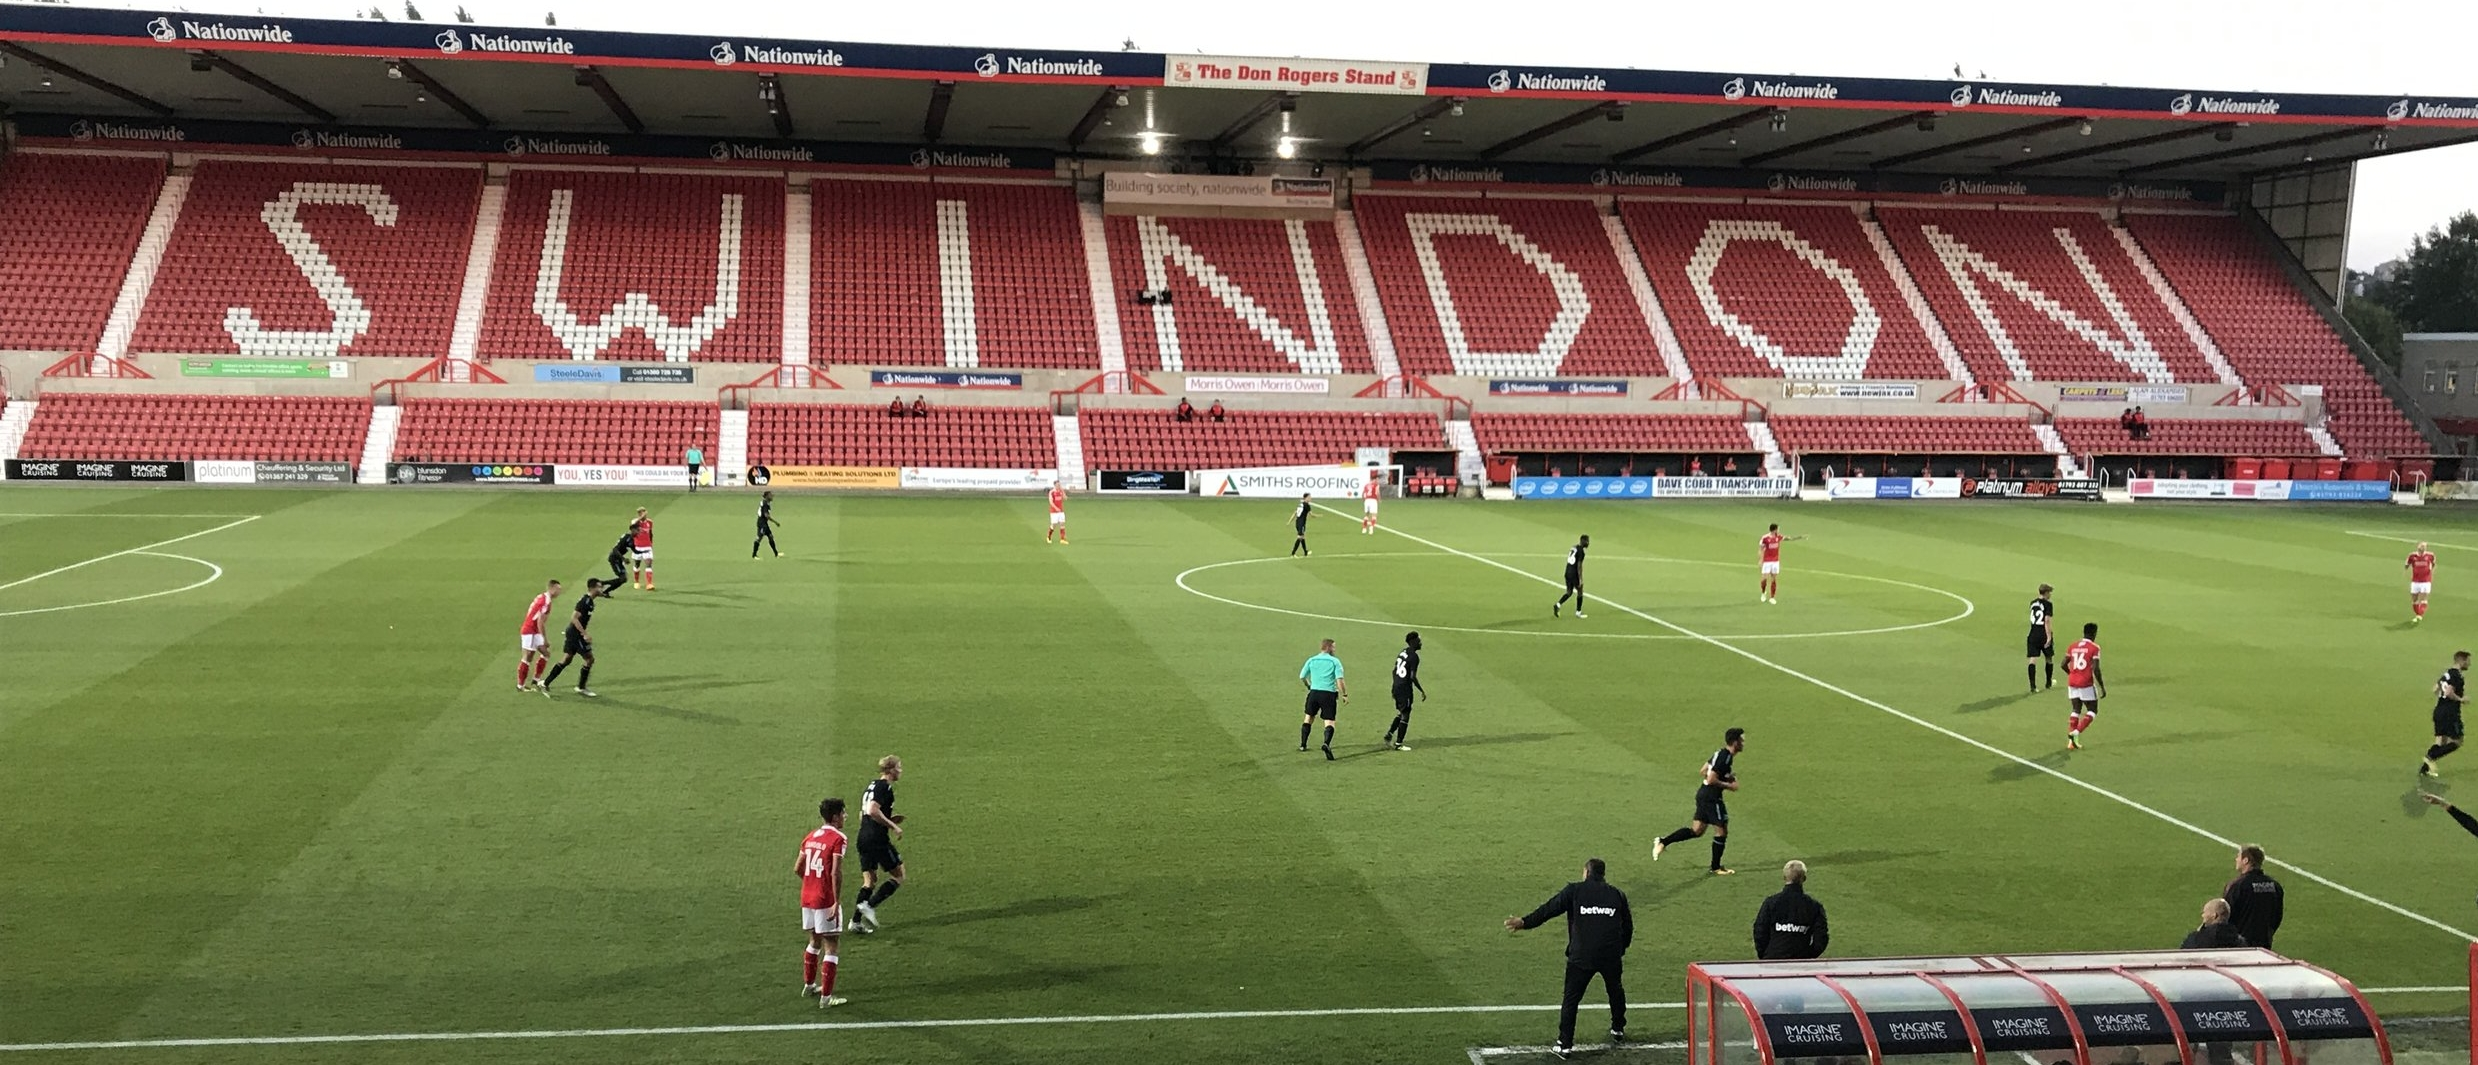 Swindon Town entertain Premier League West Ham United U21 side in the Checkatrade Trophy.